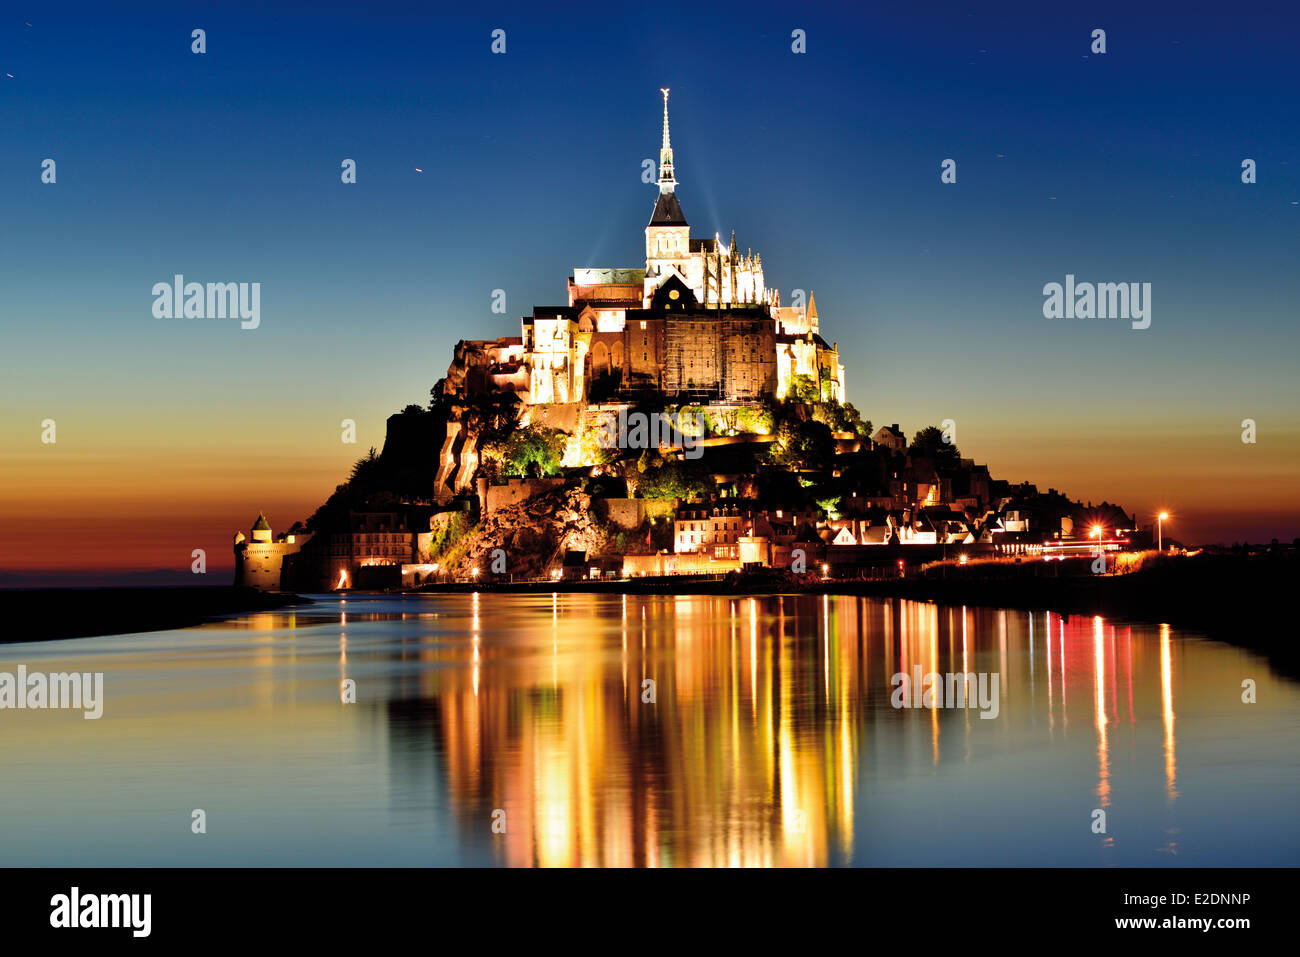 Frankreich, Normandie: Le Mont Saint-Michel bei Nacht Stockbild